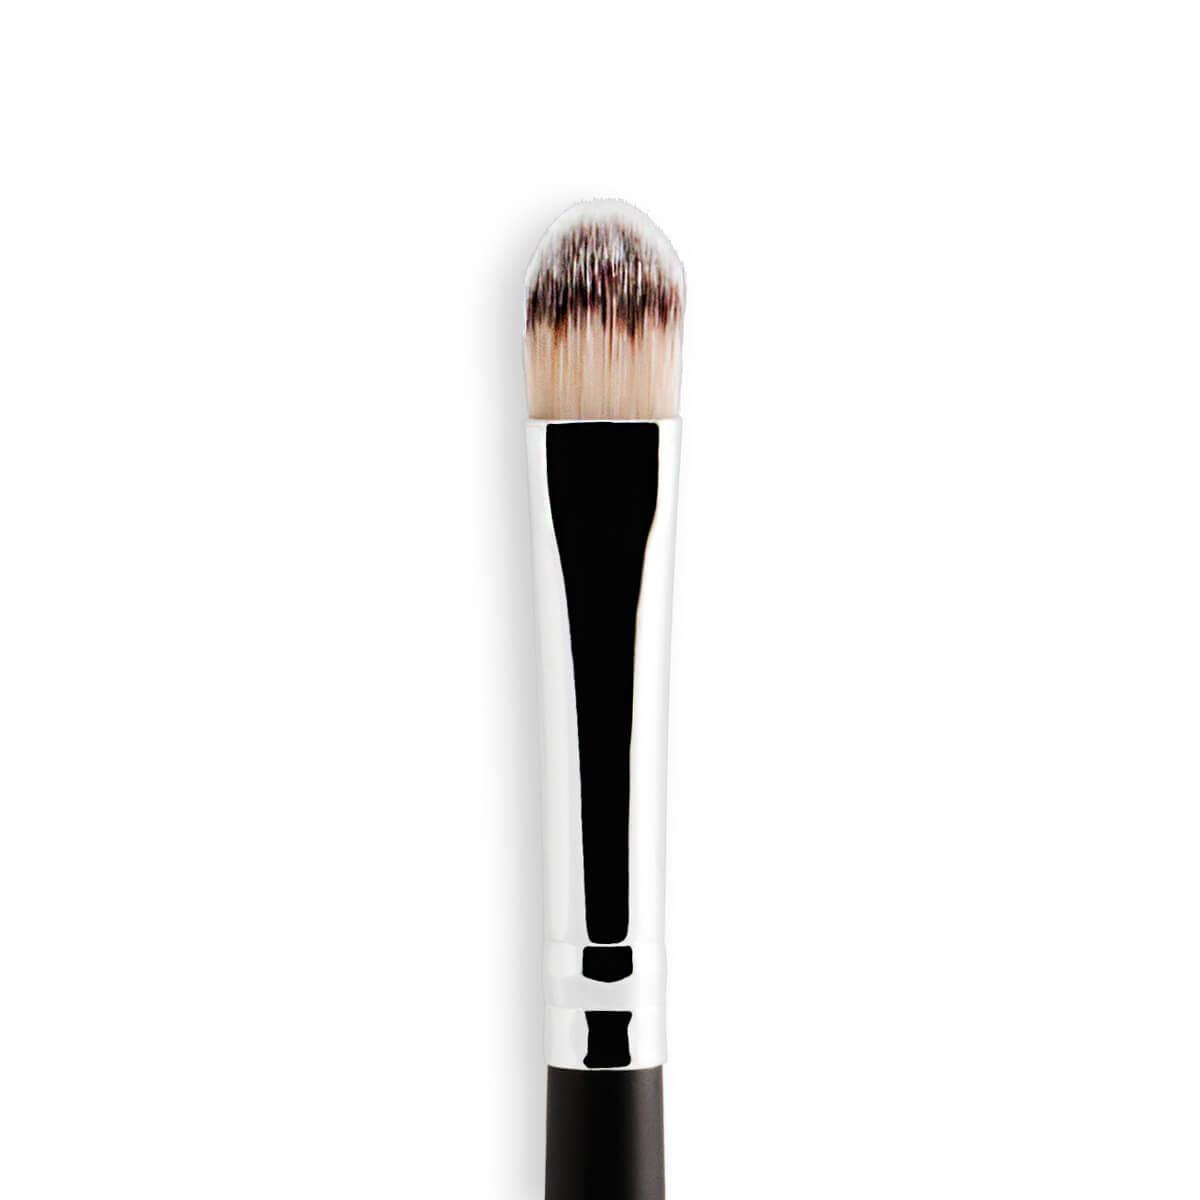 S115 - Pincel Multi Tarefas Profissional Sffumato Beauty